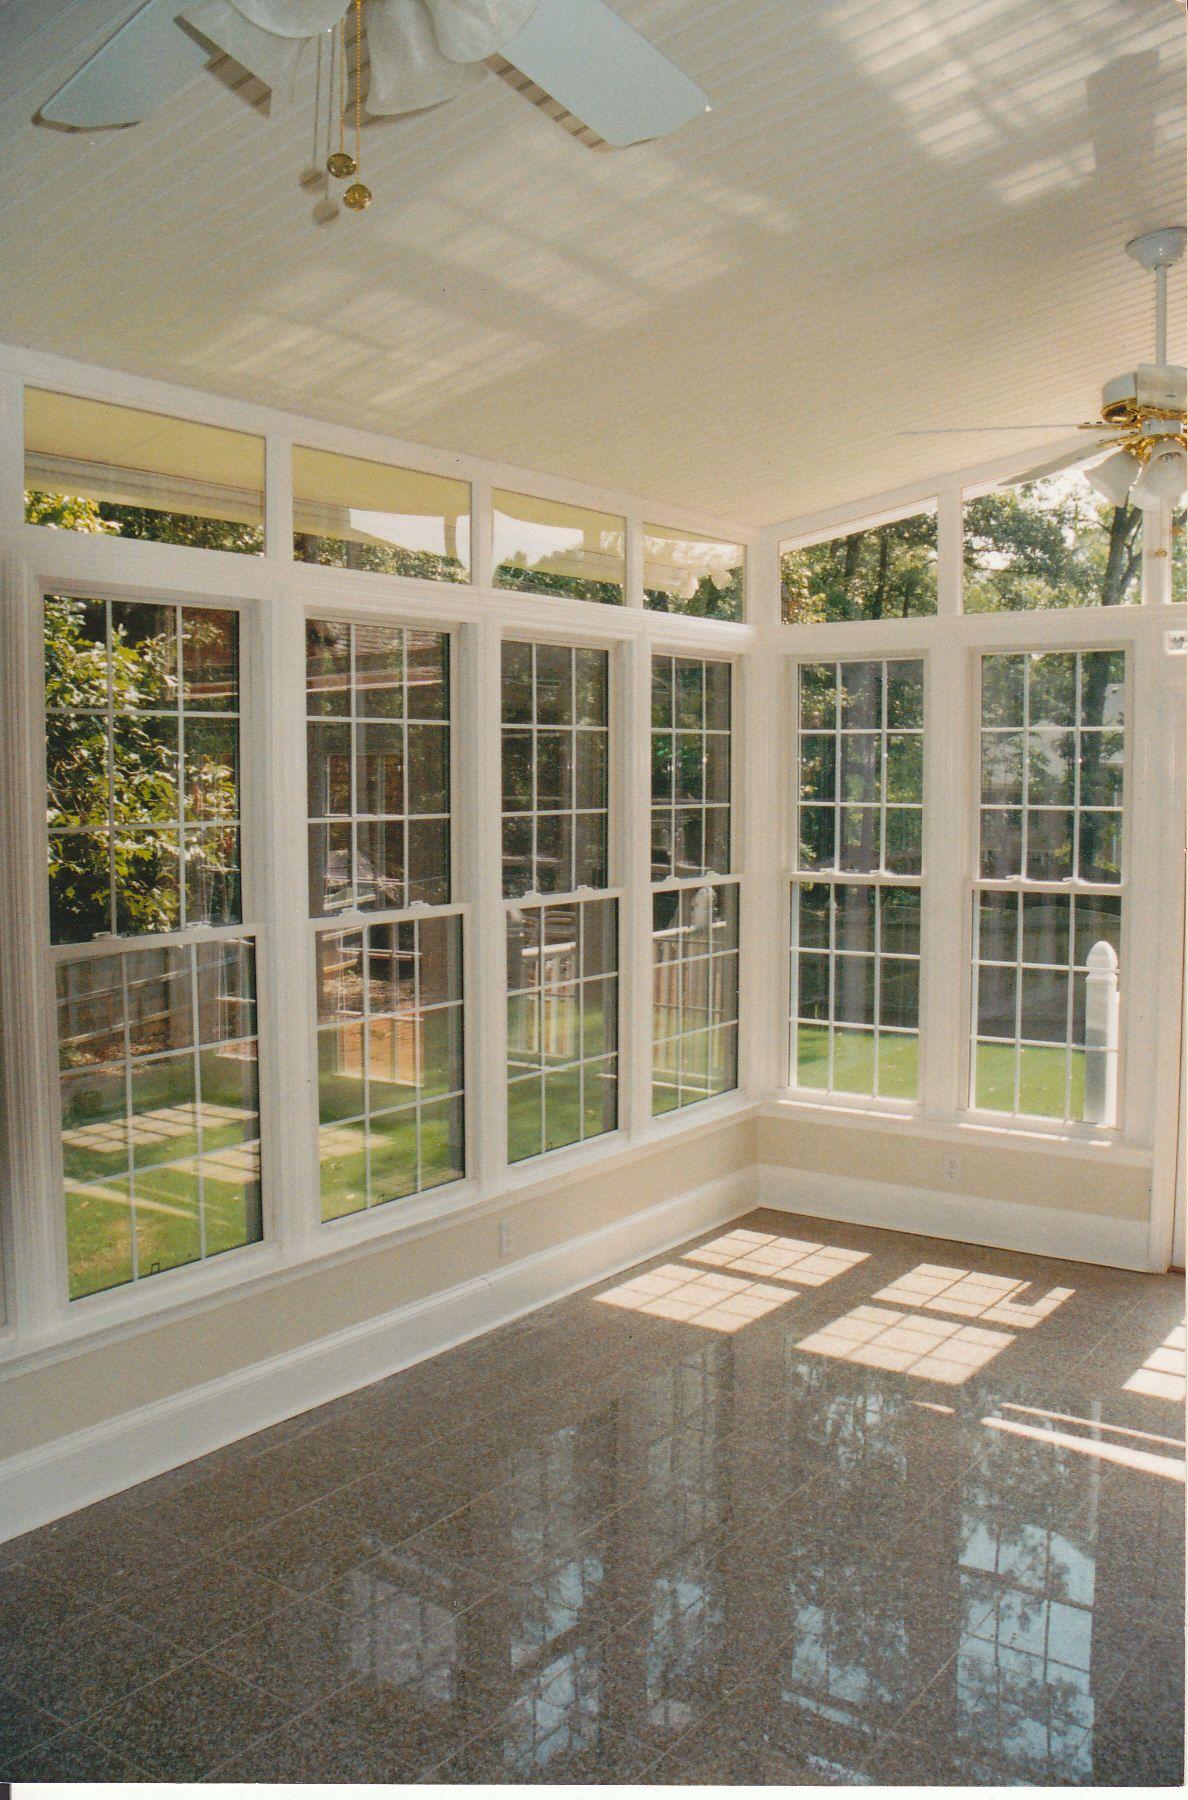 Home Additions Sunroom Decorating Four Seasons Room: Four Season Sunroom